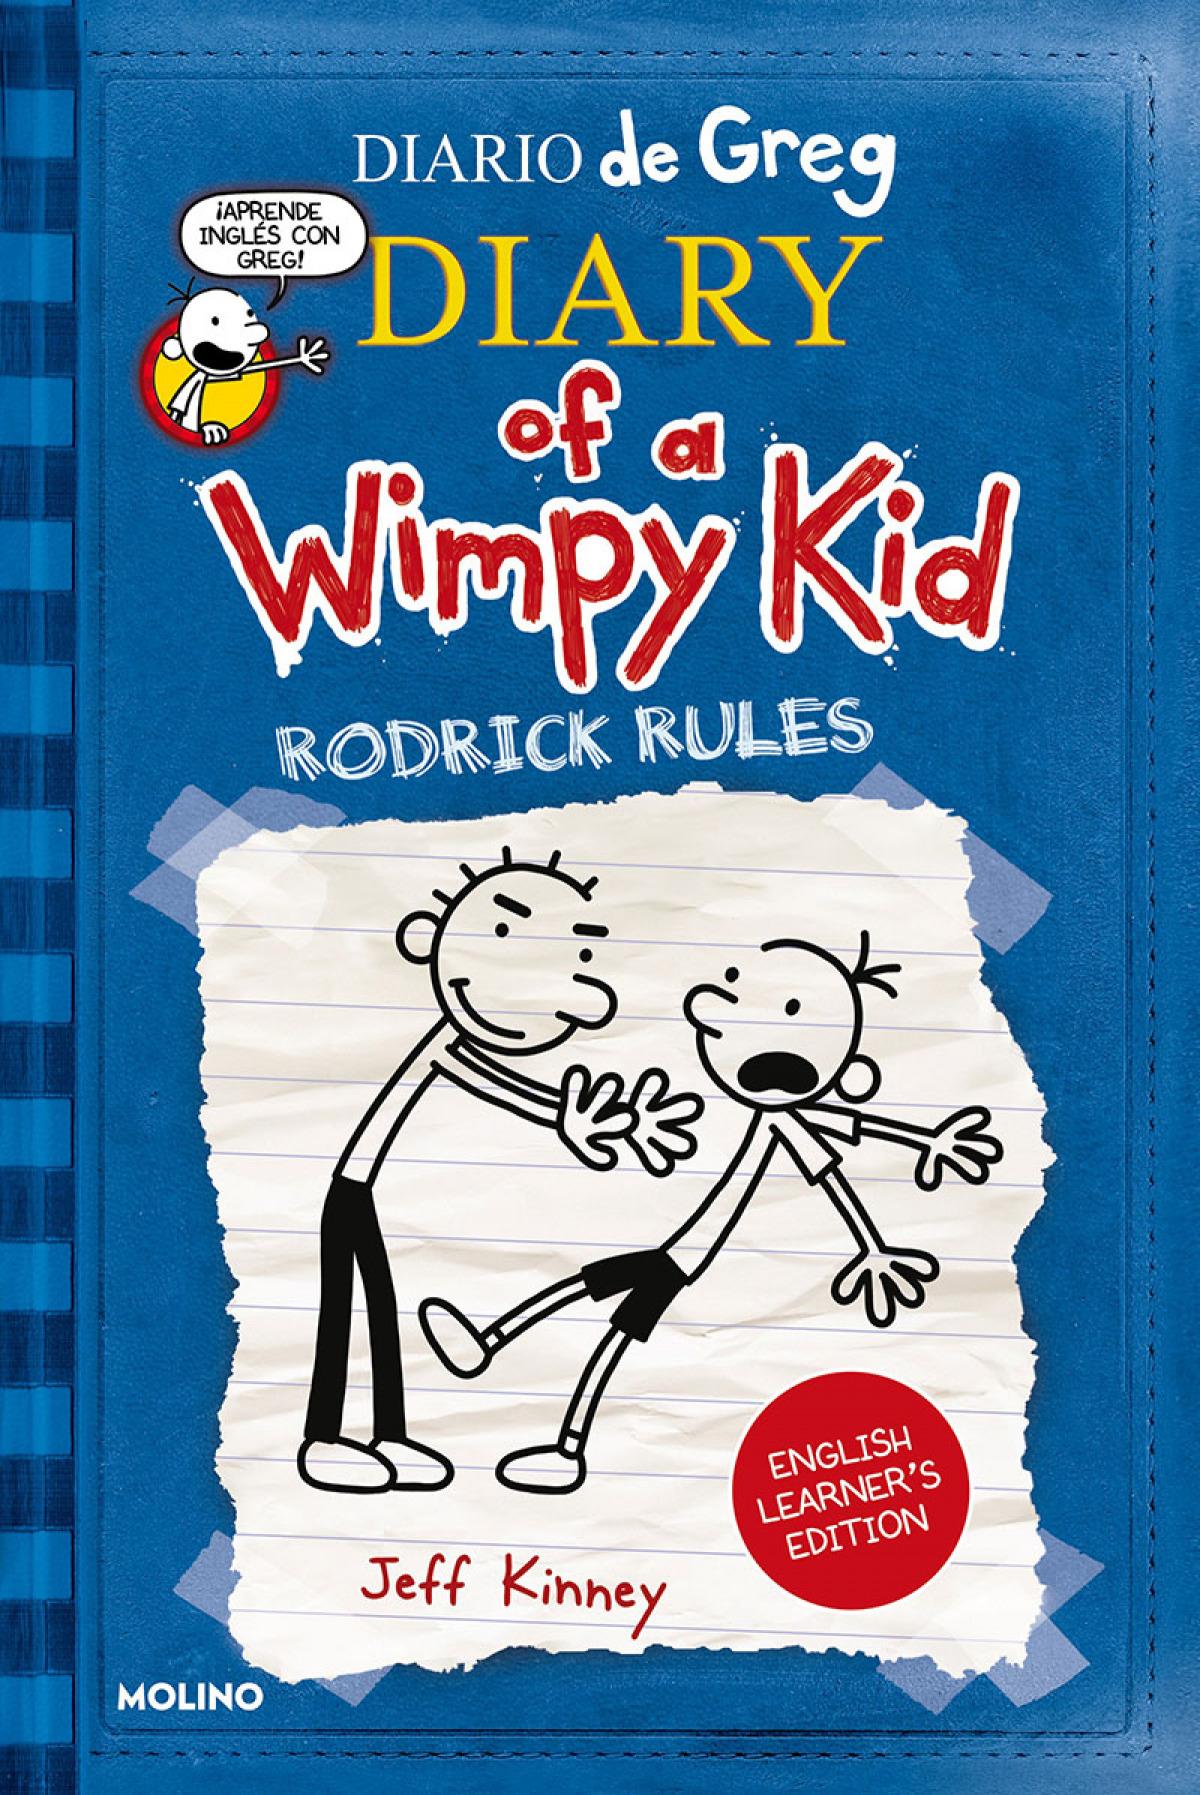 Diario de Greg 2. English Learner's Edition. Rodrick rules